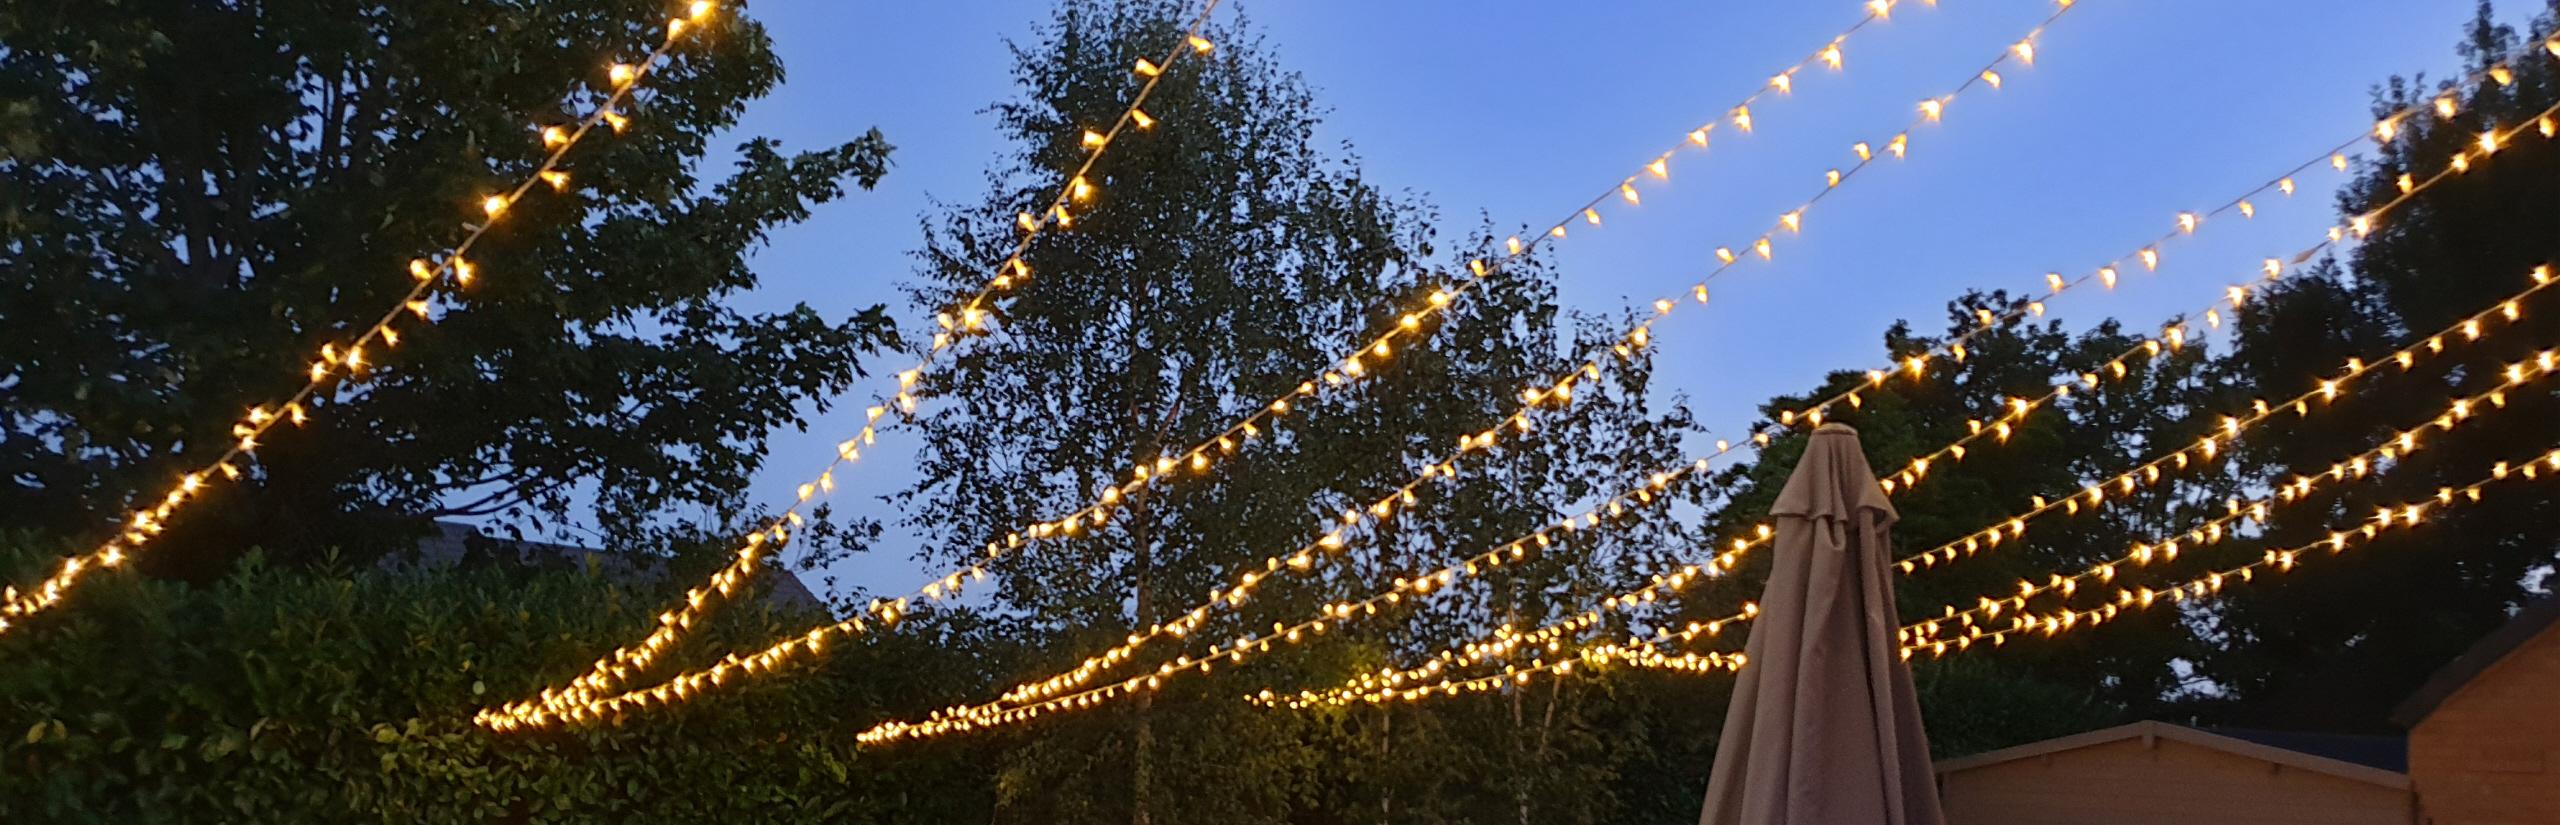 Fairy Light Hire Wedding Lighting Rental Fairy Lighting Festoon Devon